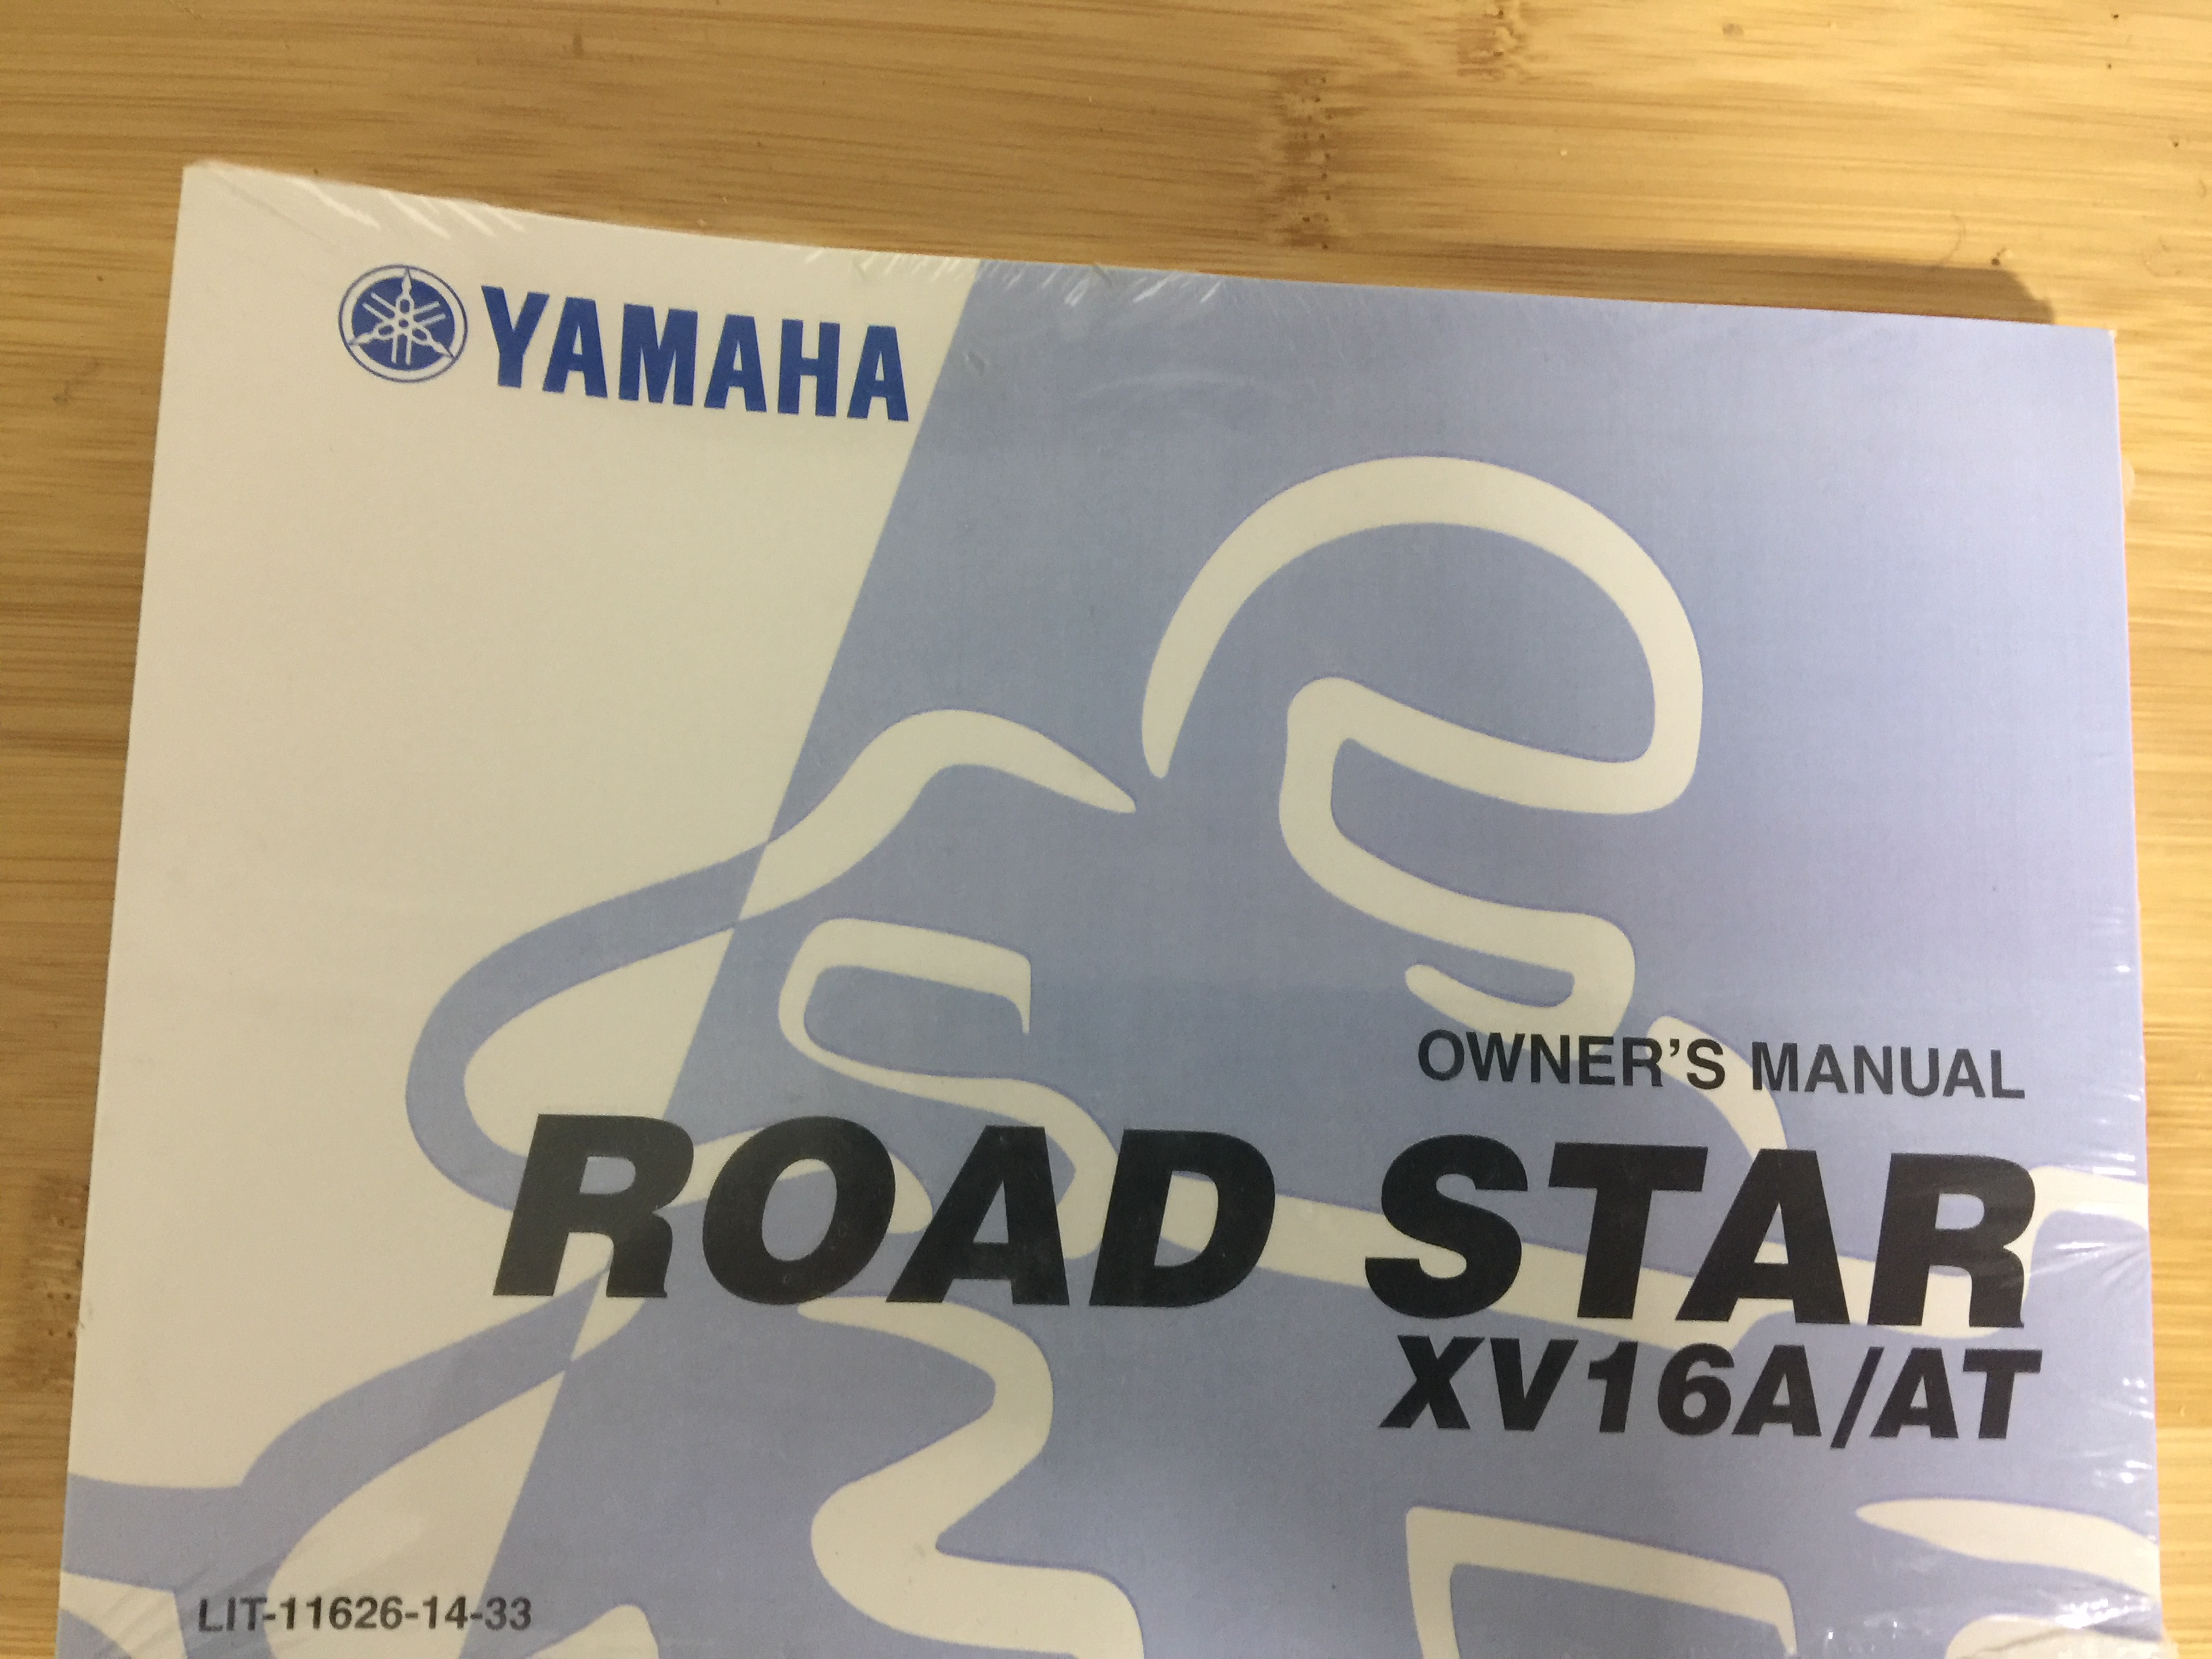 lit 11626 14 33 owners manual road star xv16a at vintage dirt rh vintagedirtandtrail com 2005 yamaha road star owners manual 2001 yamaha road star owners manual